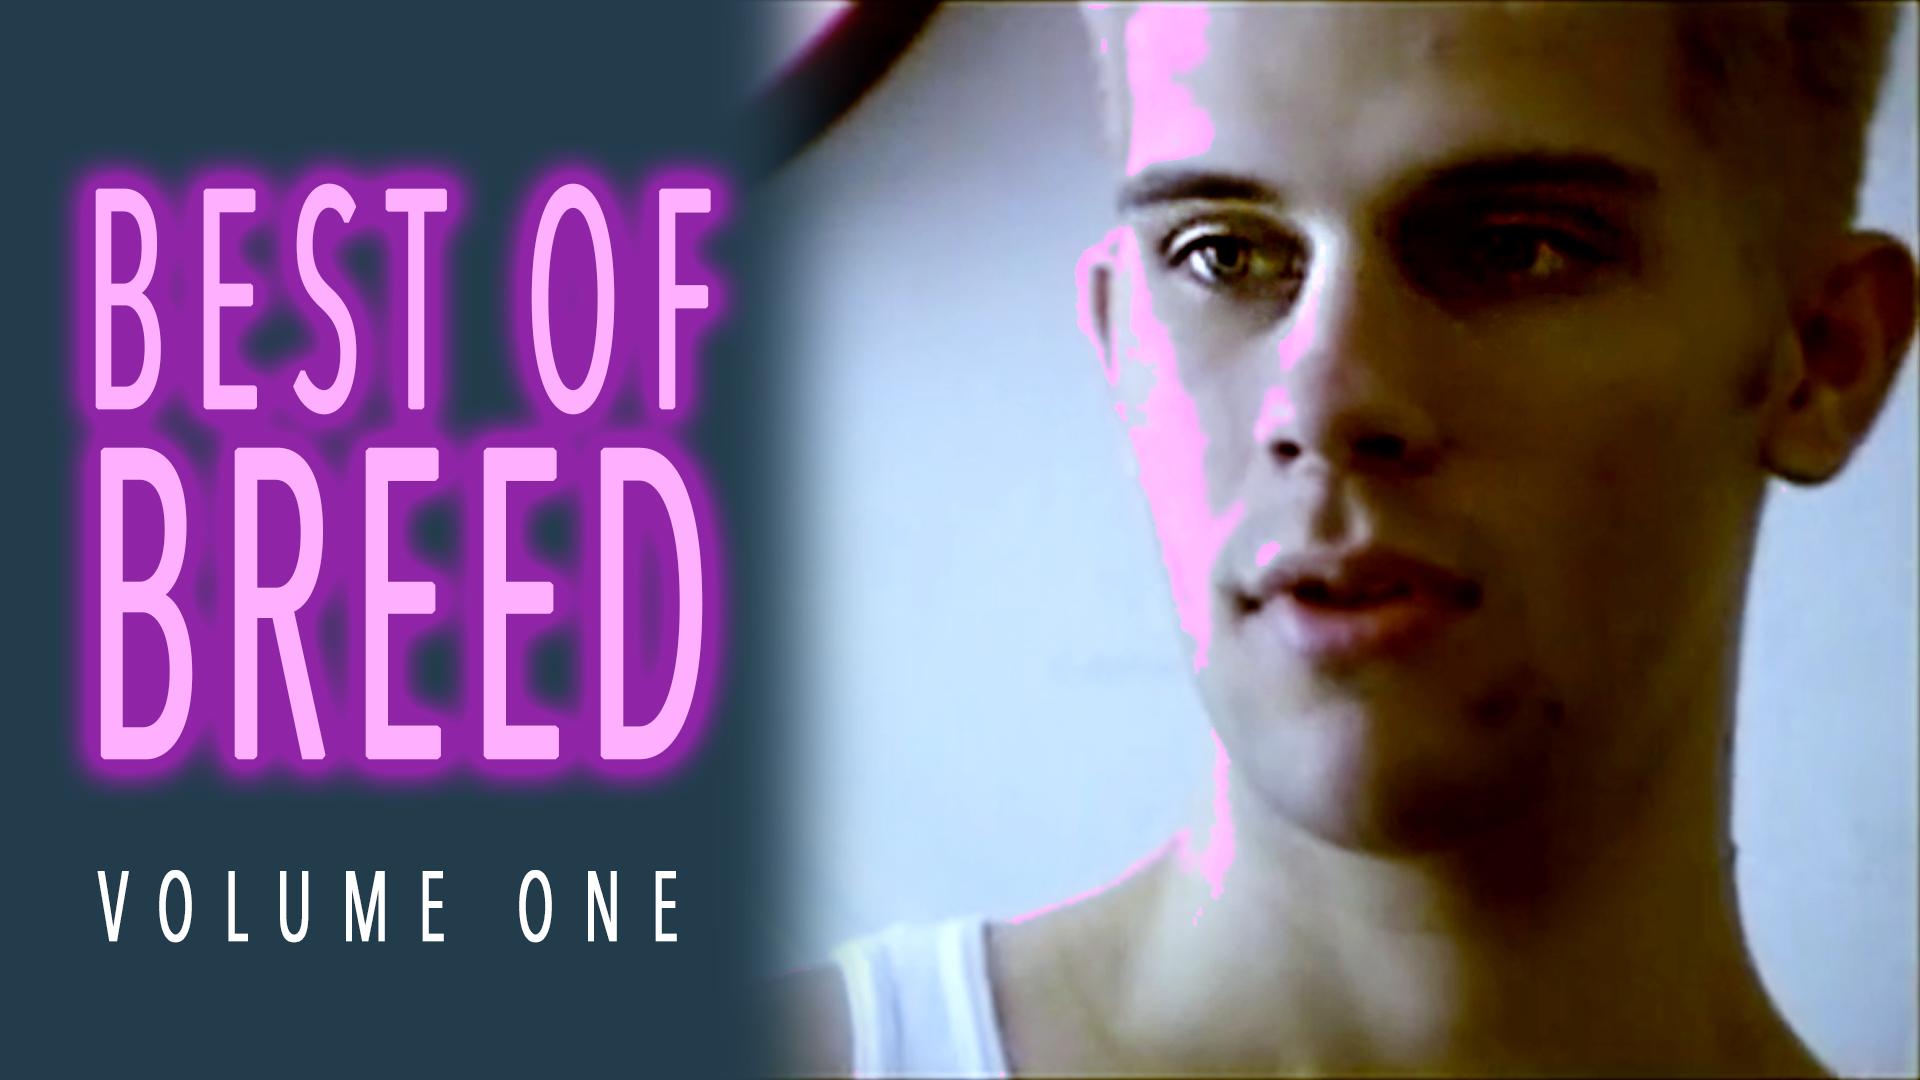 Best of Breed, Volume 1